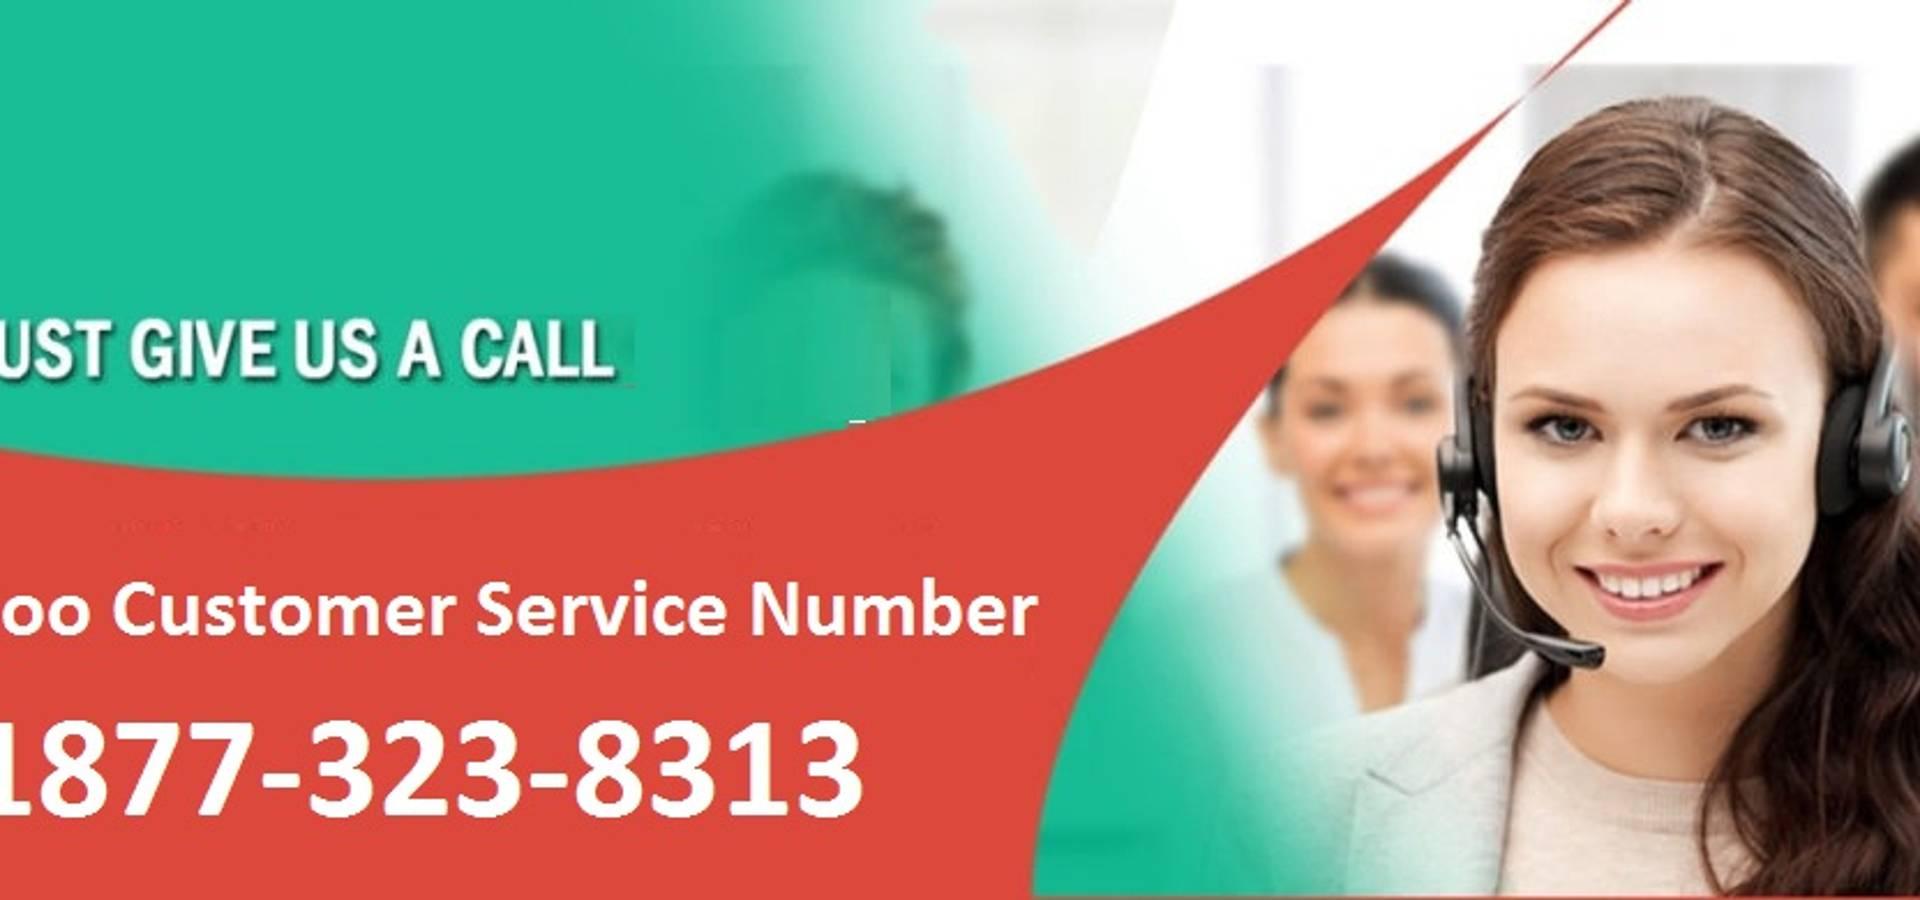 Contact Yahoo Representative 1877-323-8313